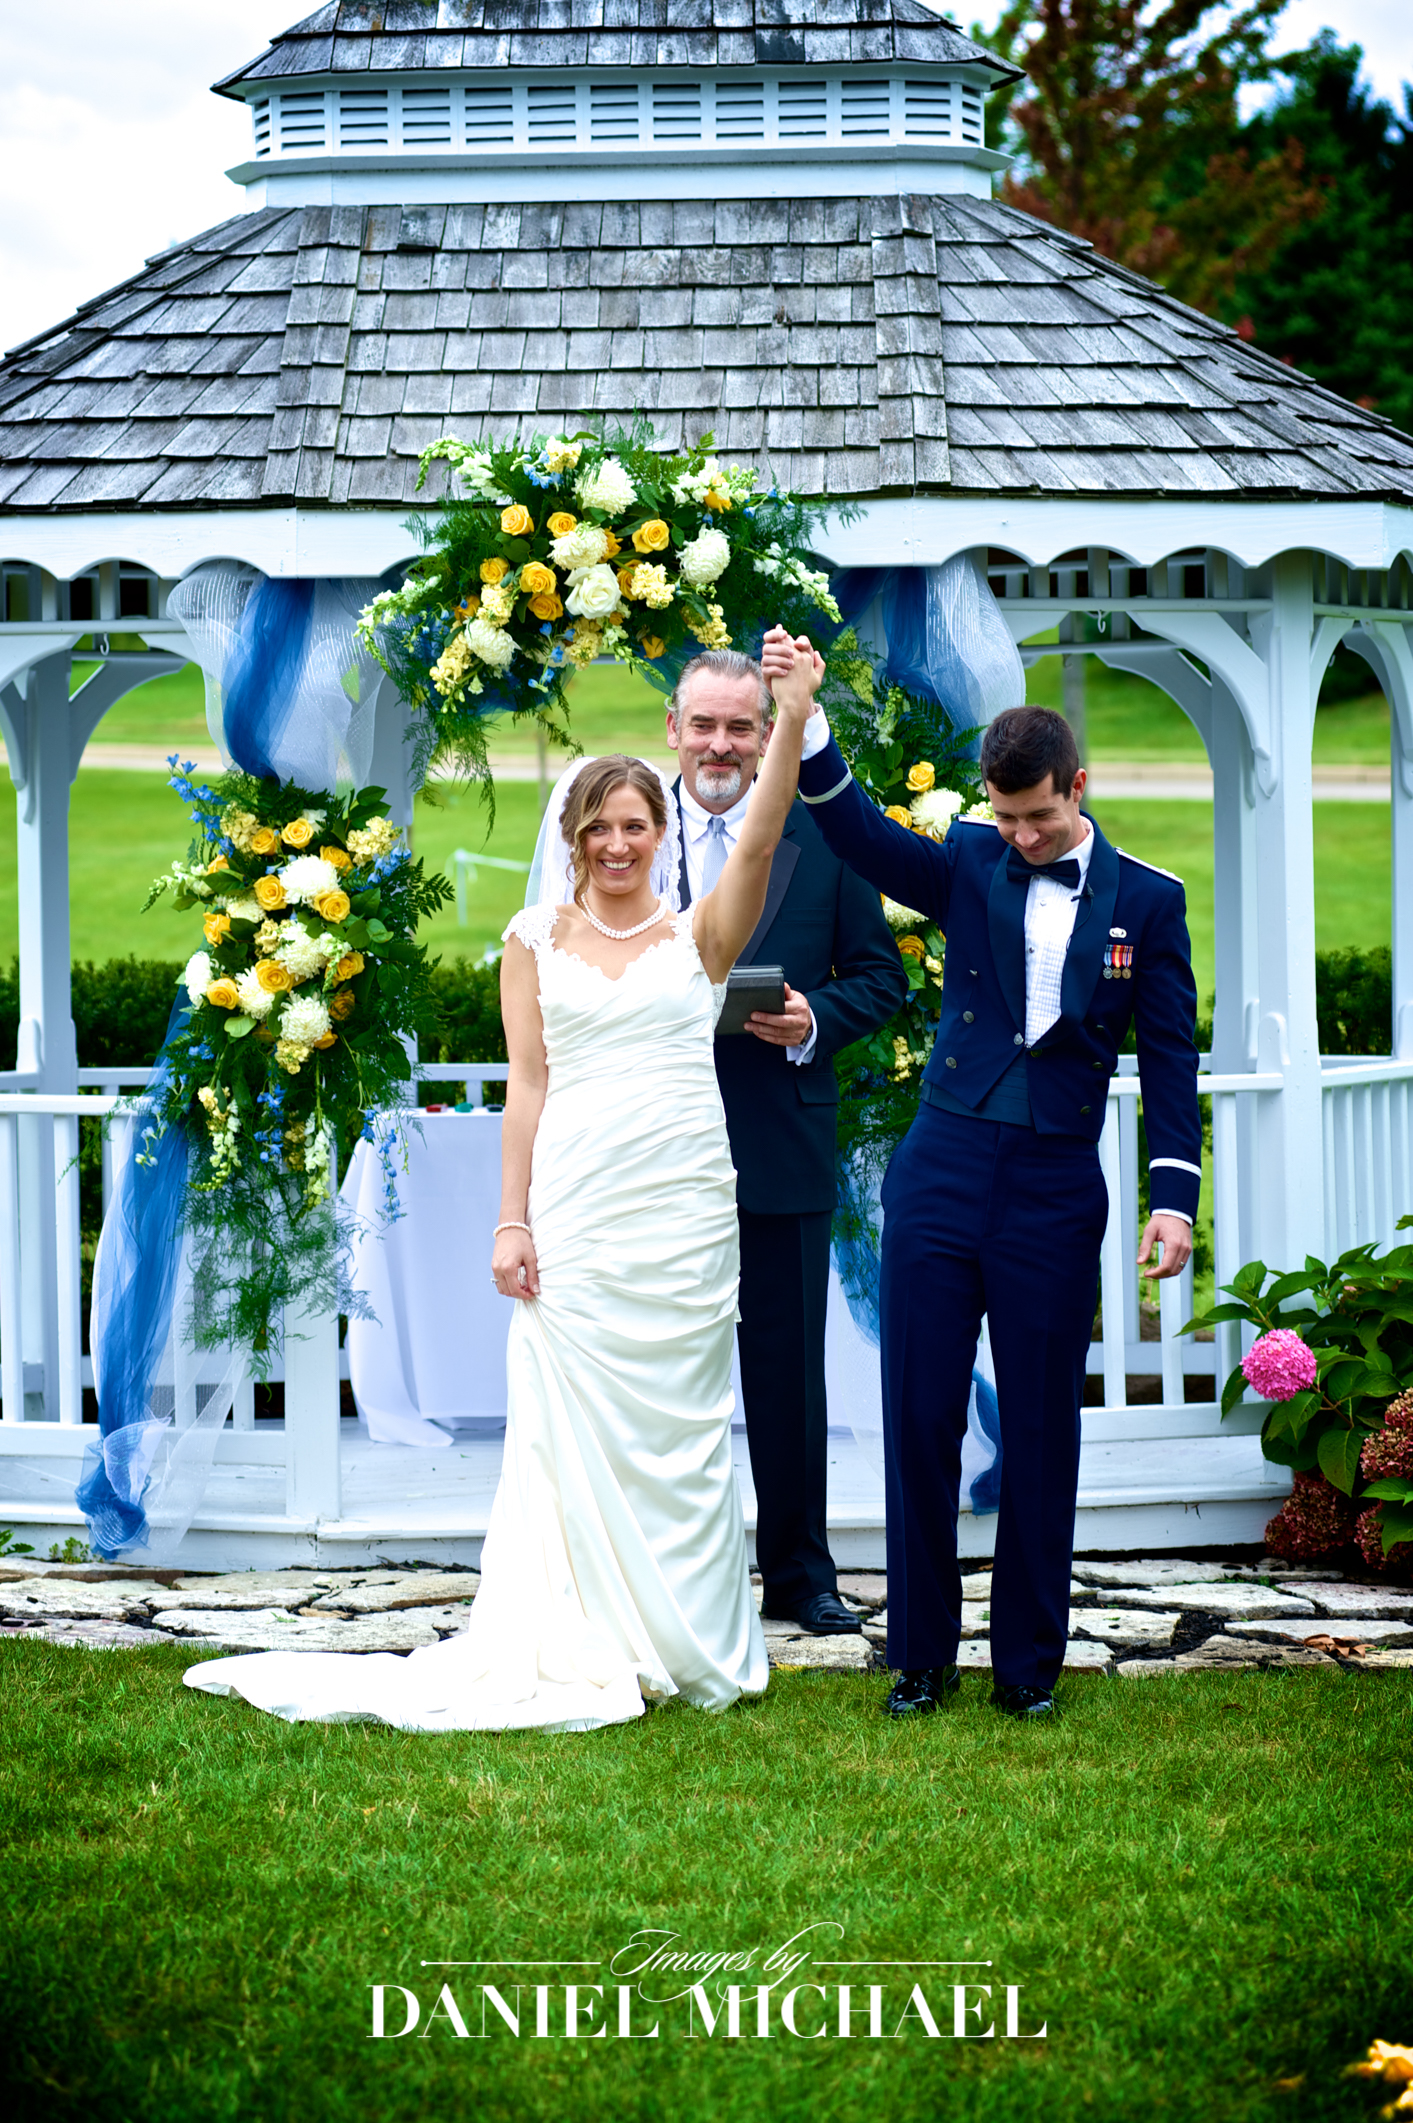 Beavercreek Golf Ceremony Venue Wedding Photography